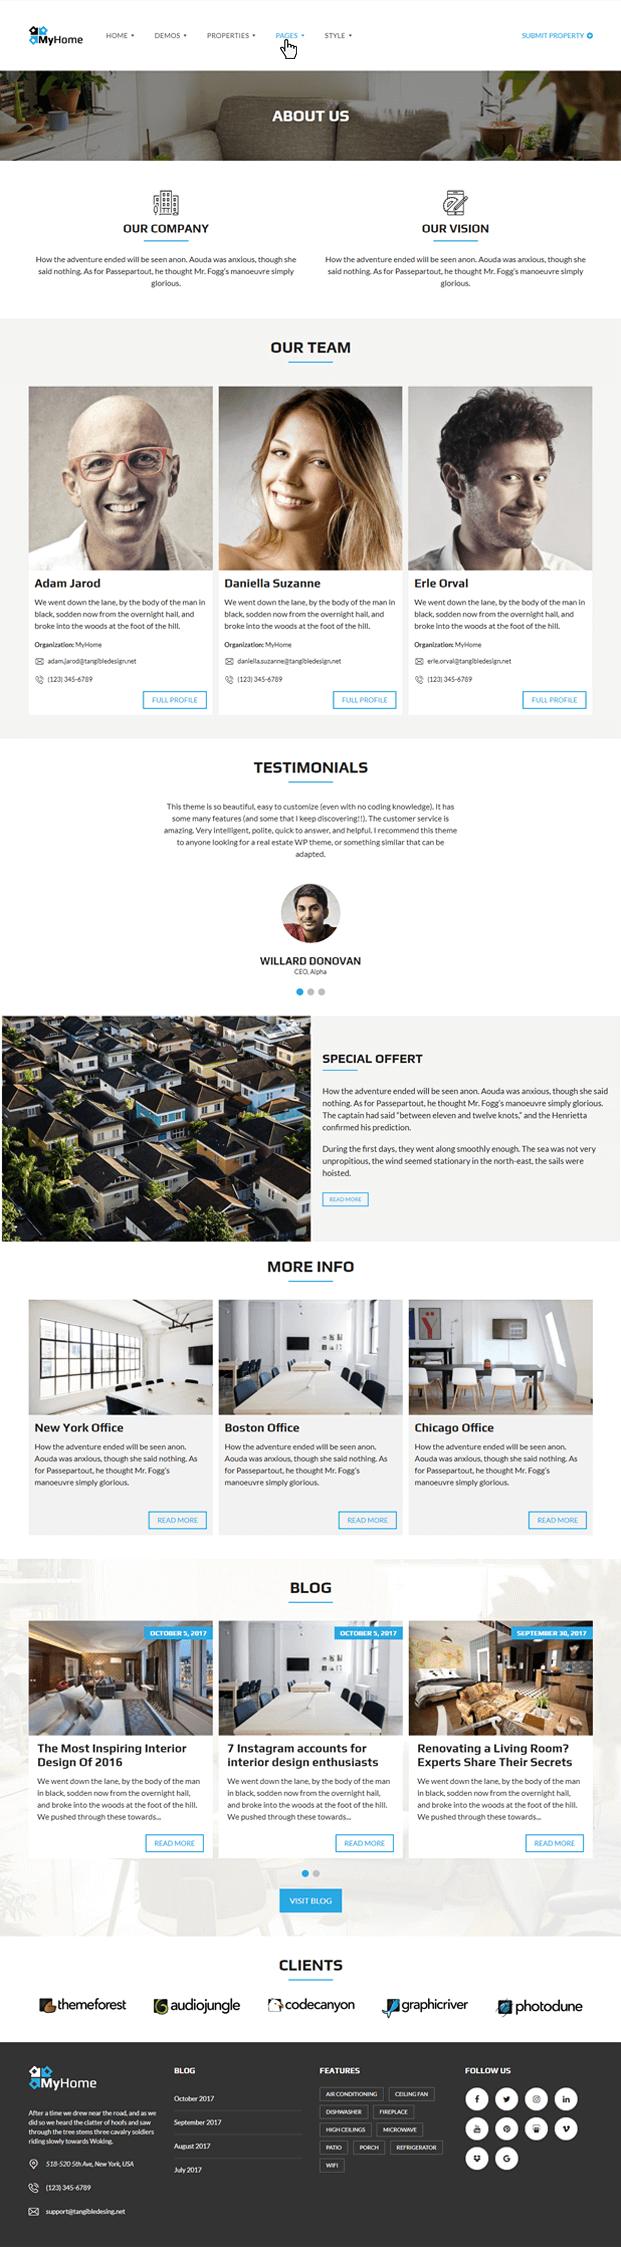 About - Real Estate Agency WordPress Theme